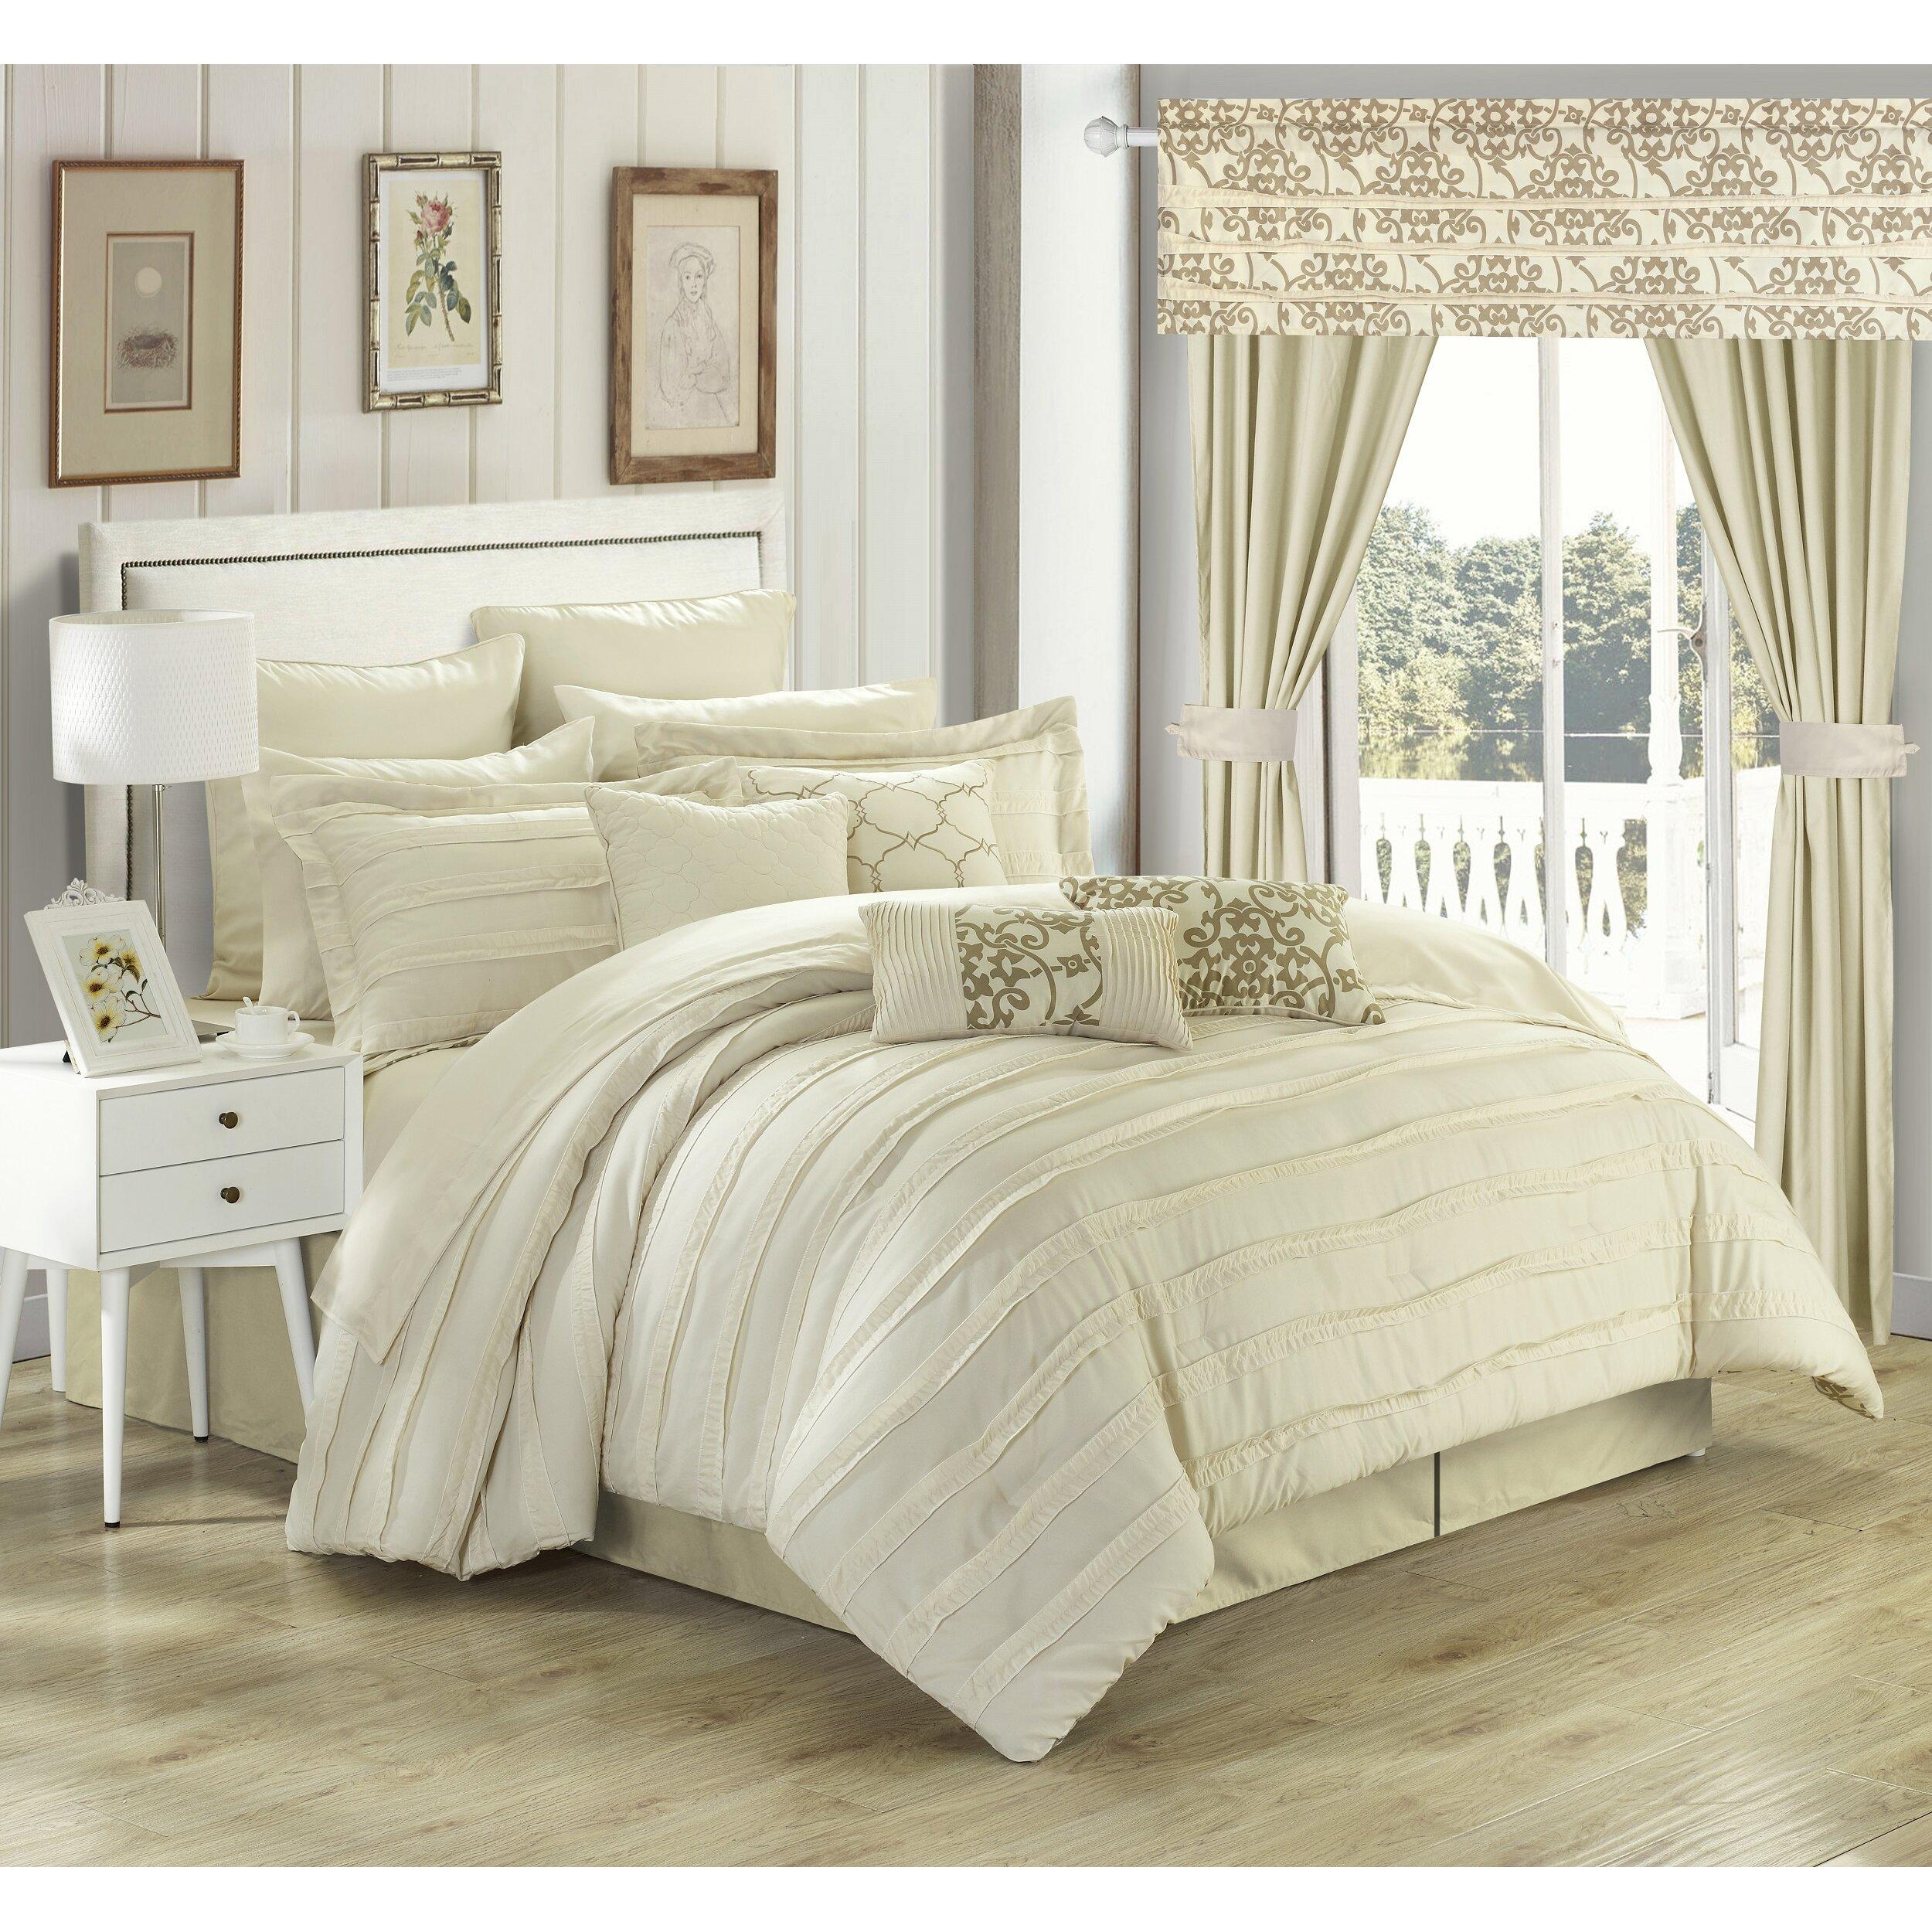 Chic Home Hailee 24 Piece Comforter Set Amp Reviews Wayfair